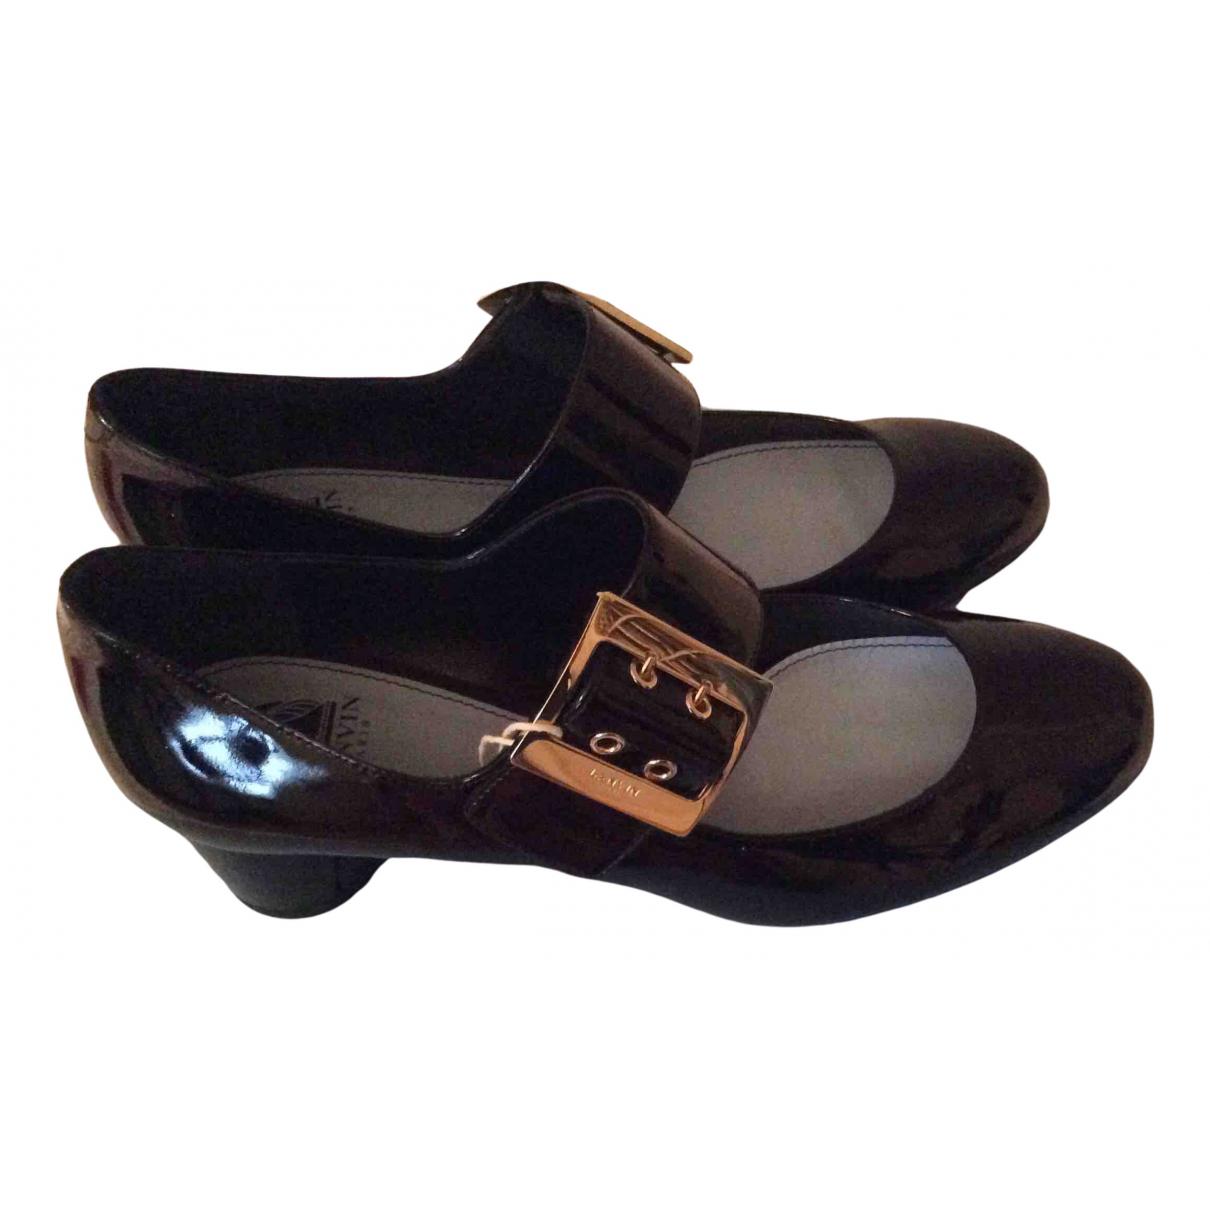 Lanvin N Black Patent leather Heels for Women 38.5 IT